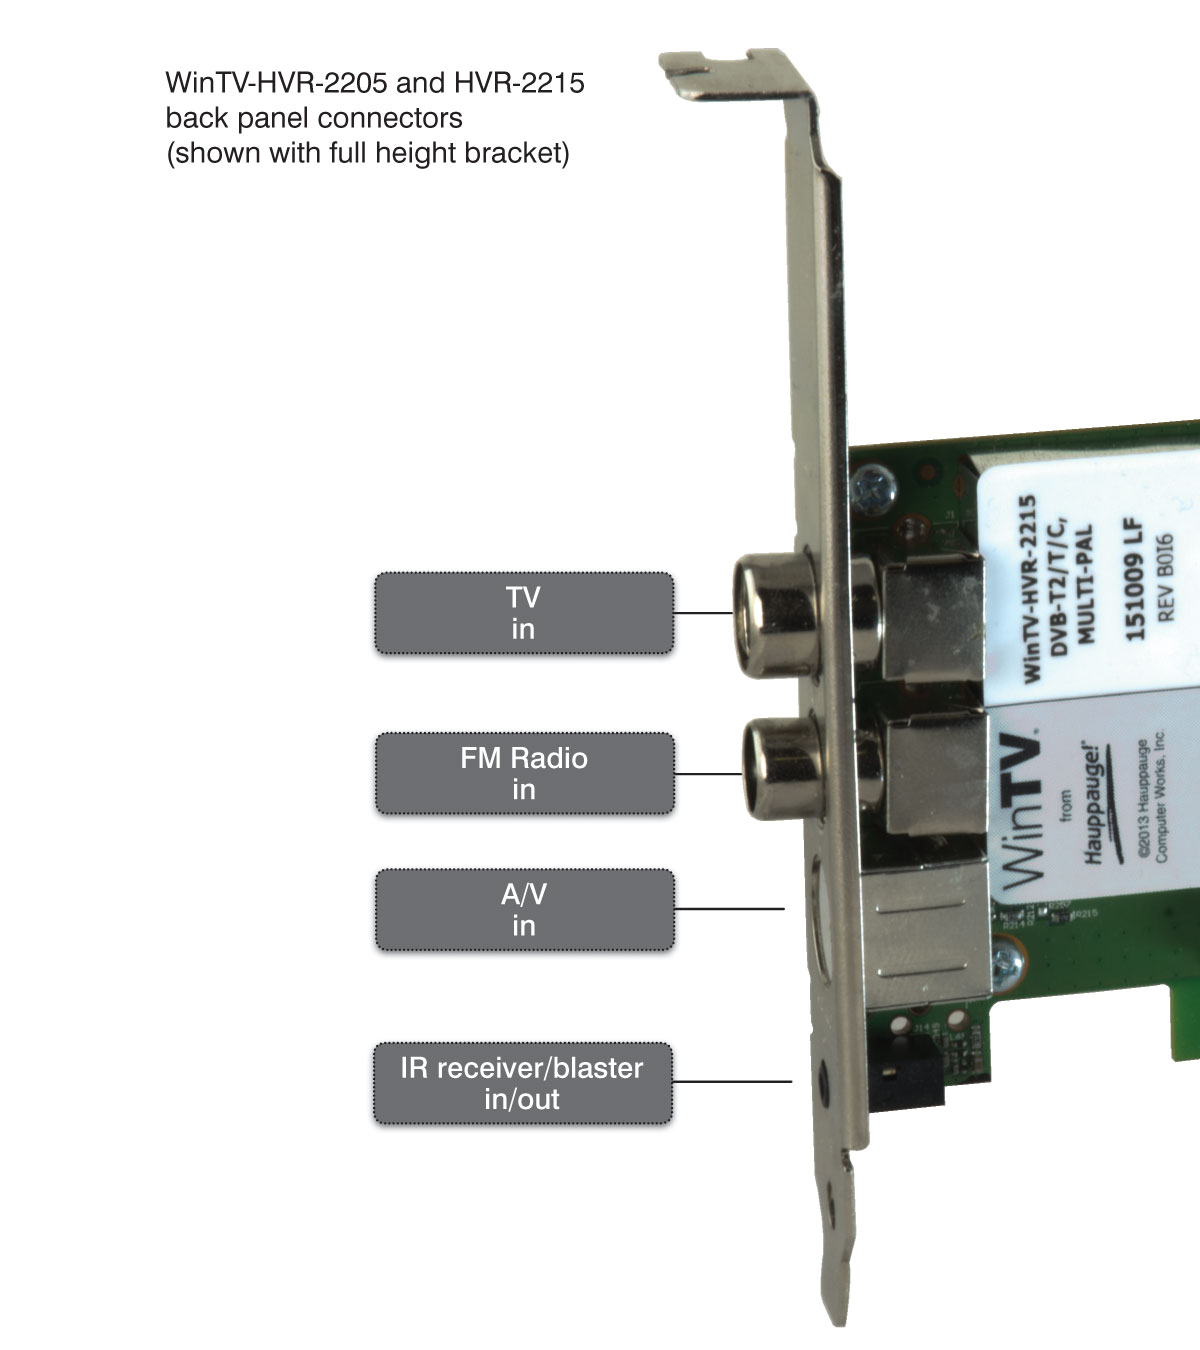 WinTV-HVR-2205 Board Product Description